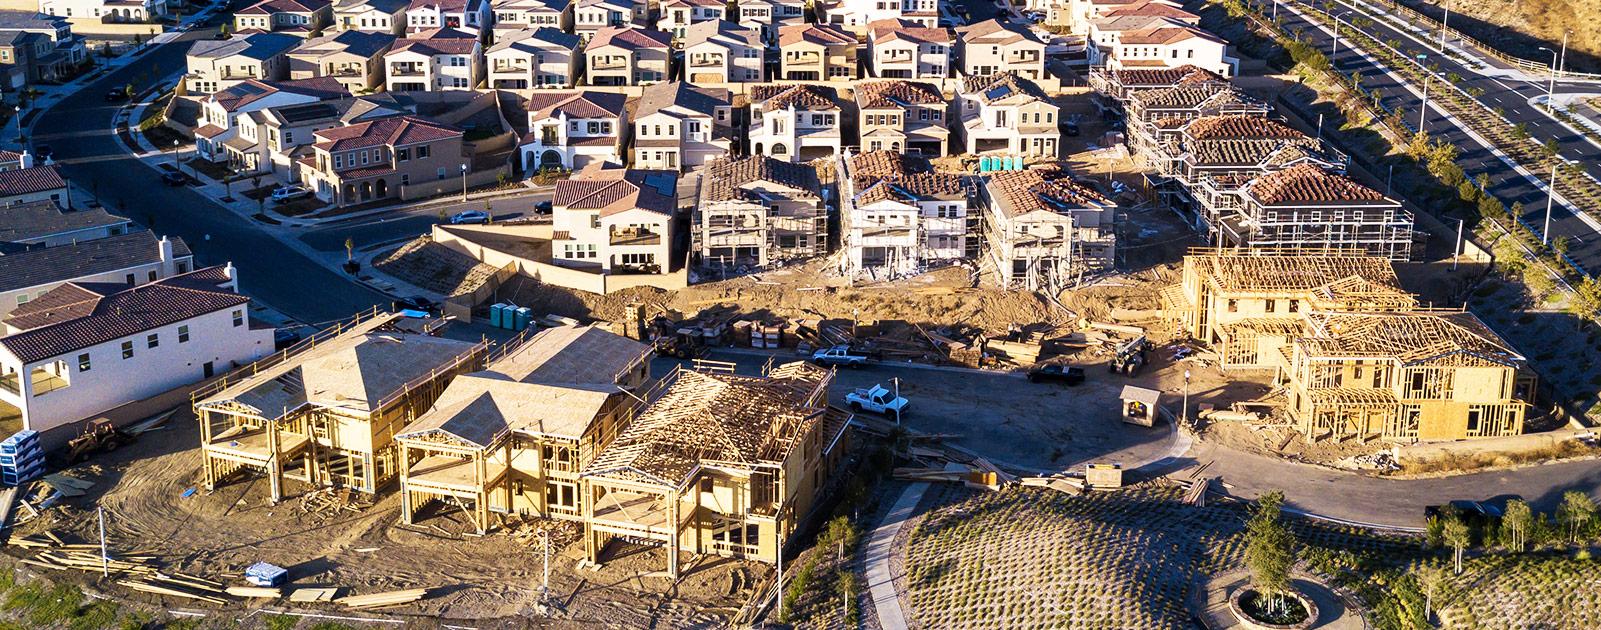 neighborhood under construction